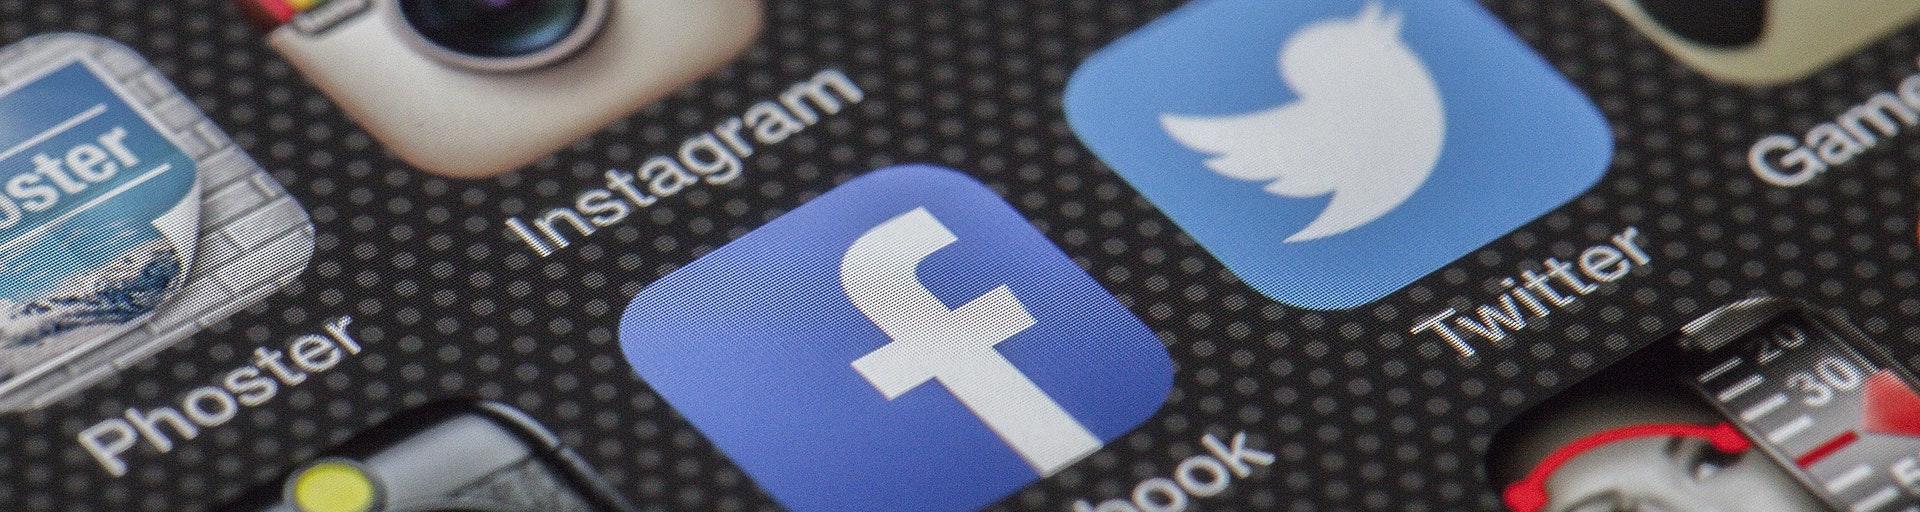 social media optimization strategy